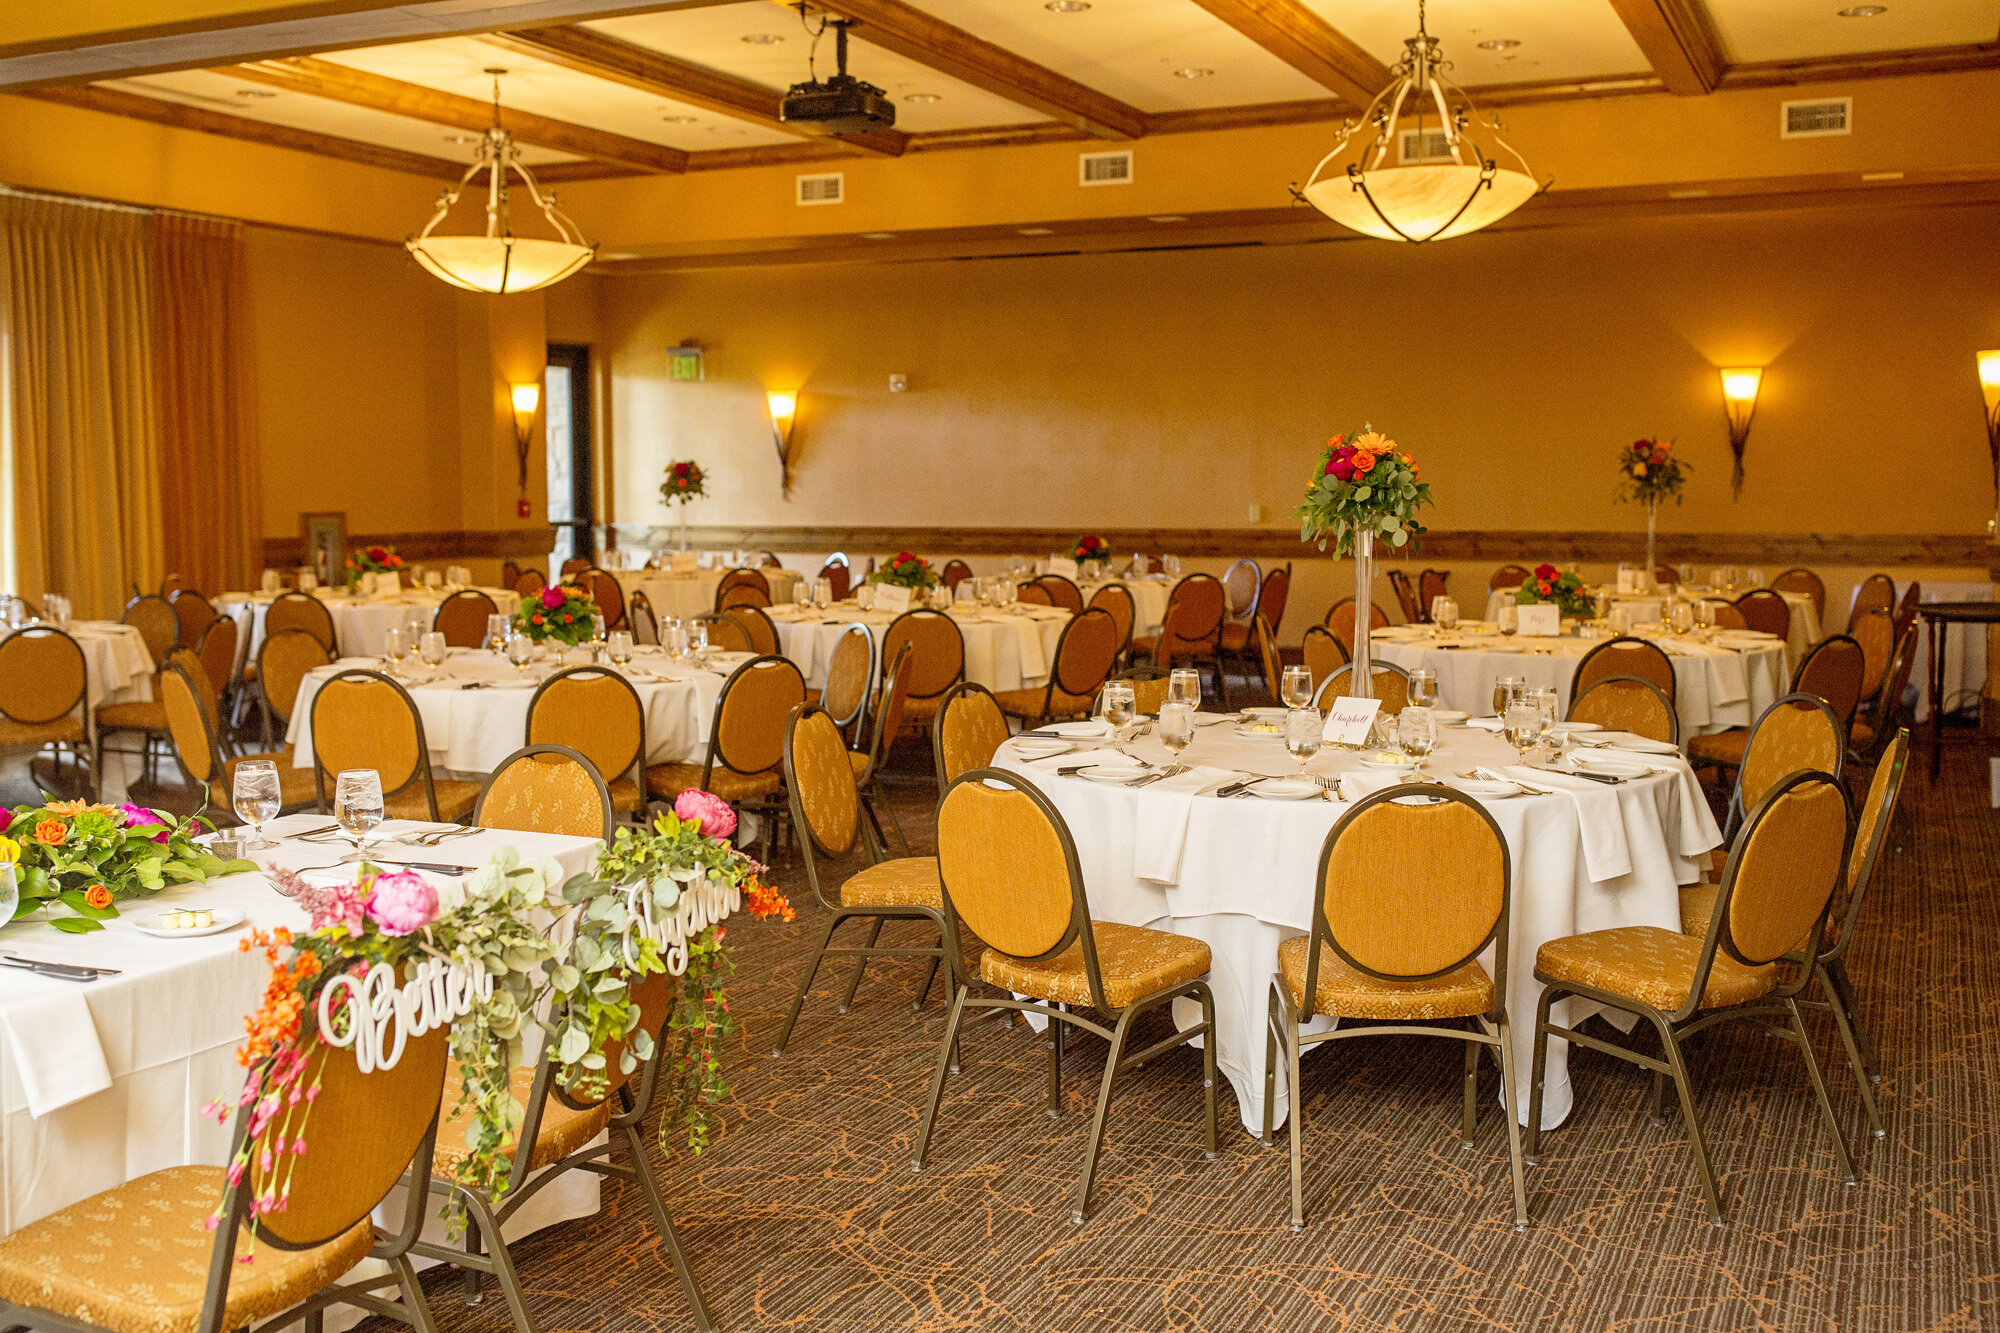 Seriously_Sabrina_Photography_Colorado_Springs_Club_at_Flying_Horse_Destination_Wedding_ODwyer90.jpg